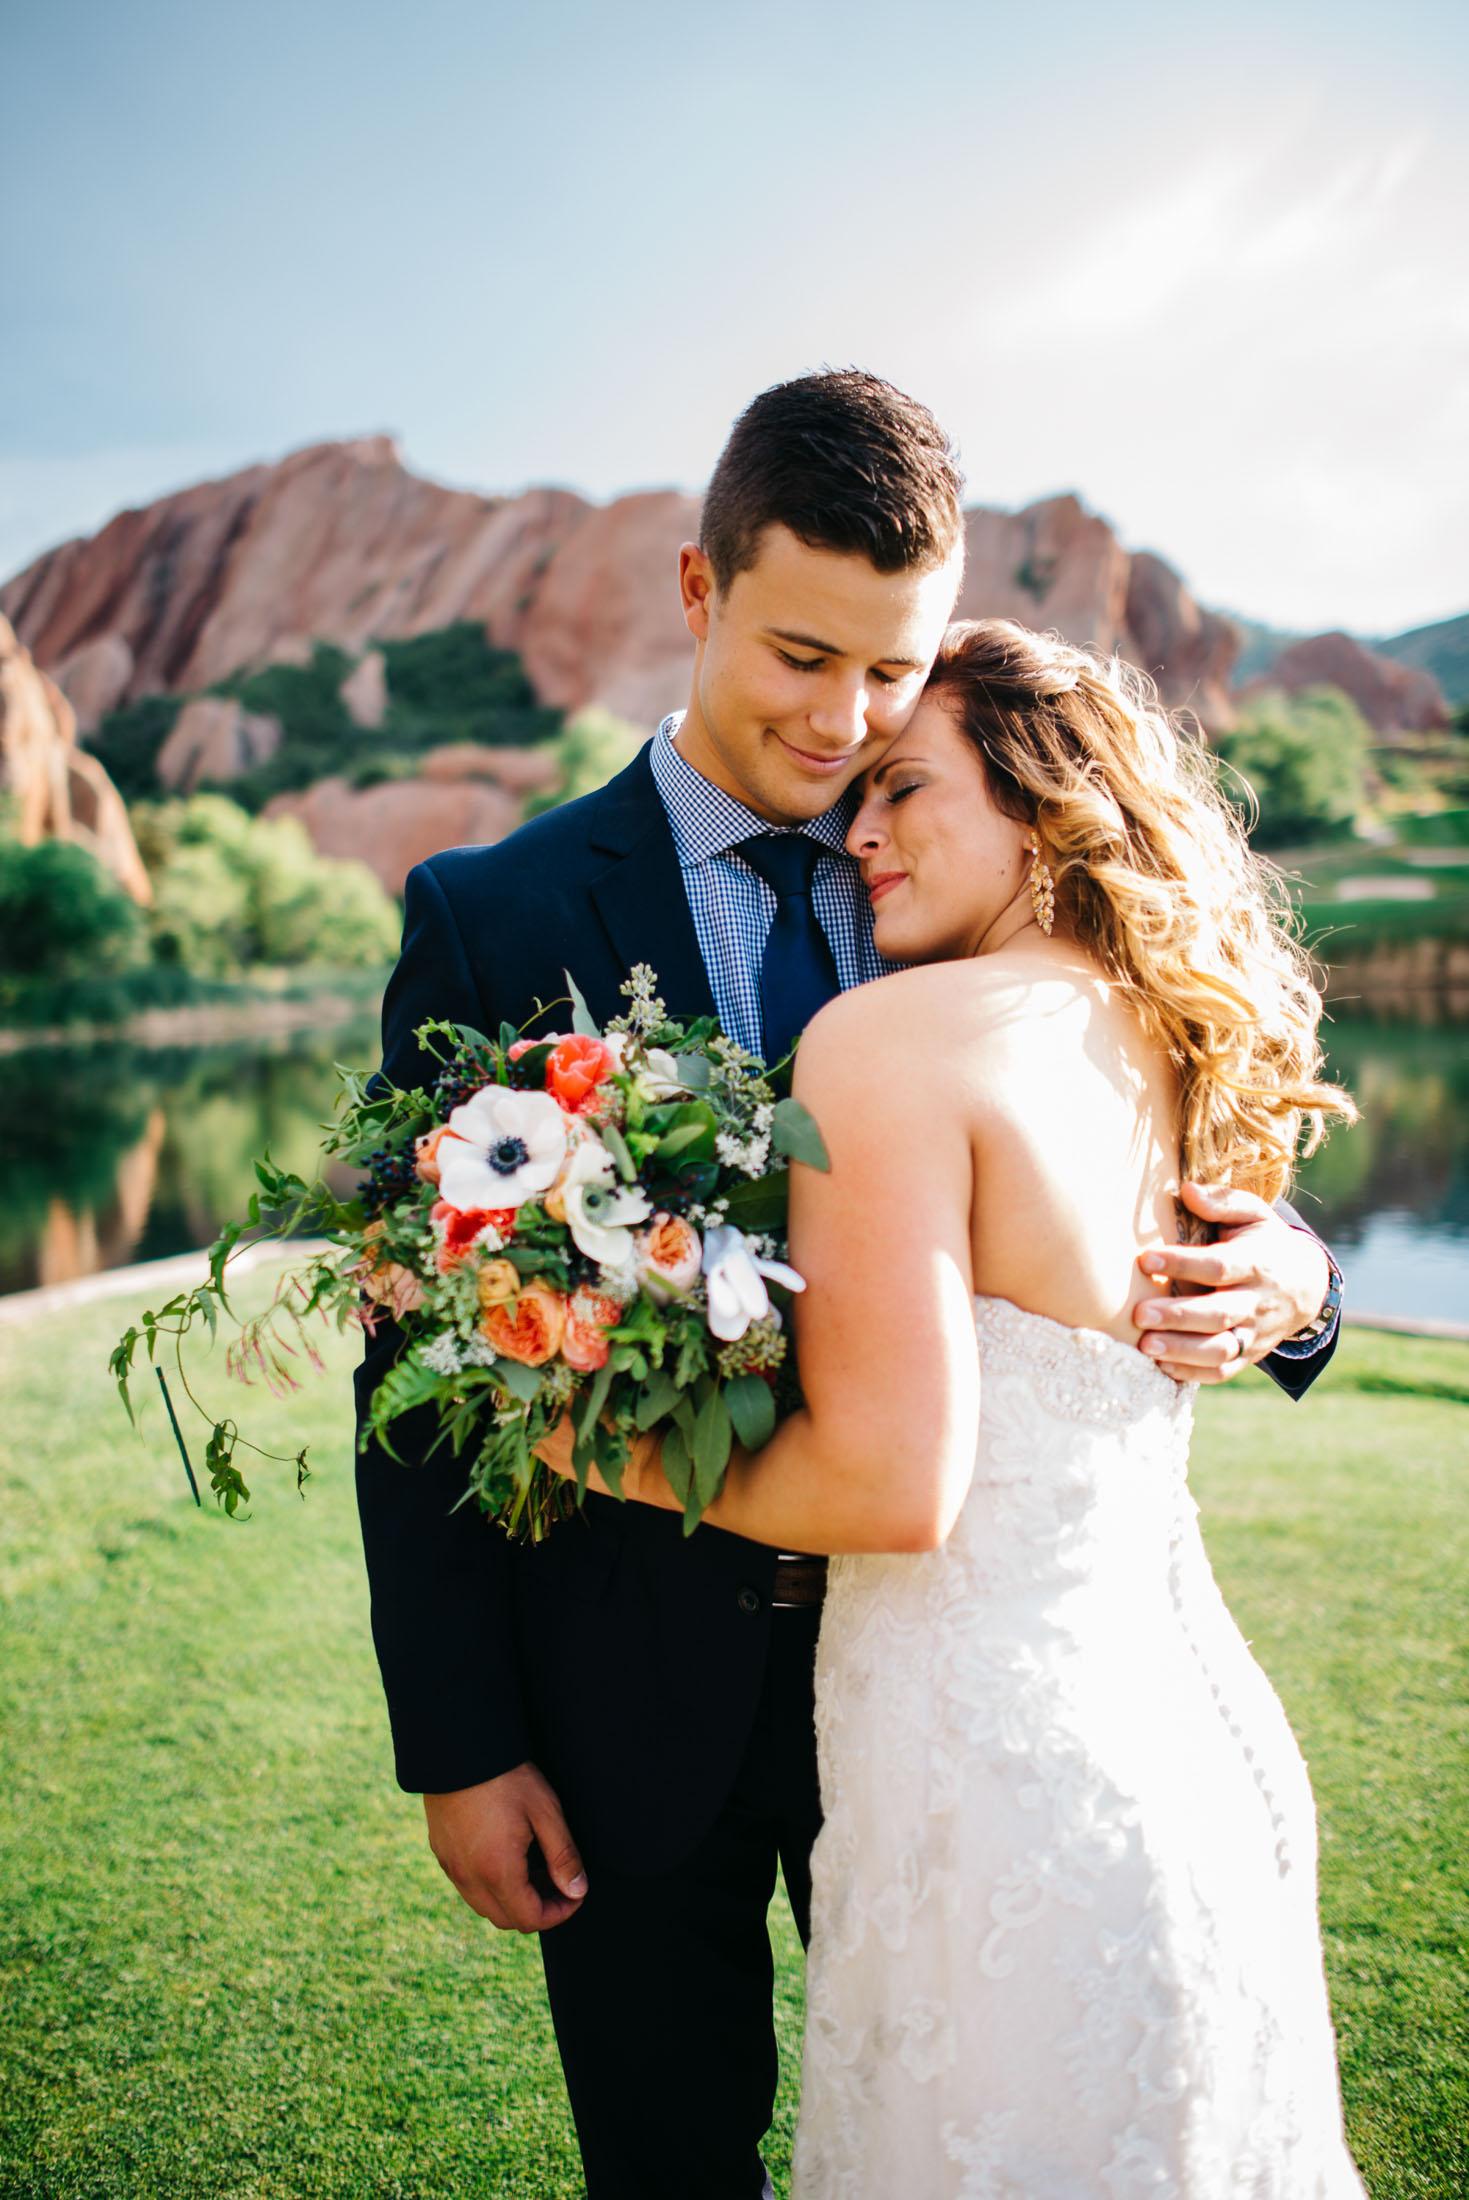 38elopement-photographer-colorado-arrowhead-wedding-jordan&jace-2893.jpg